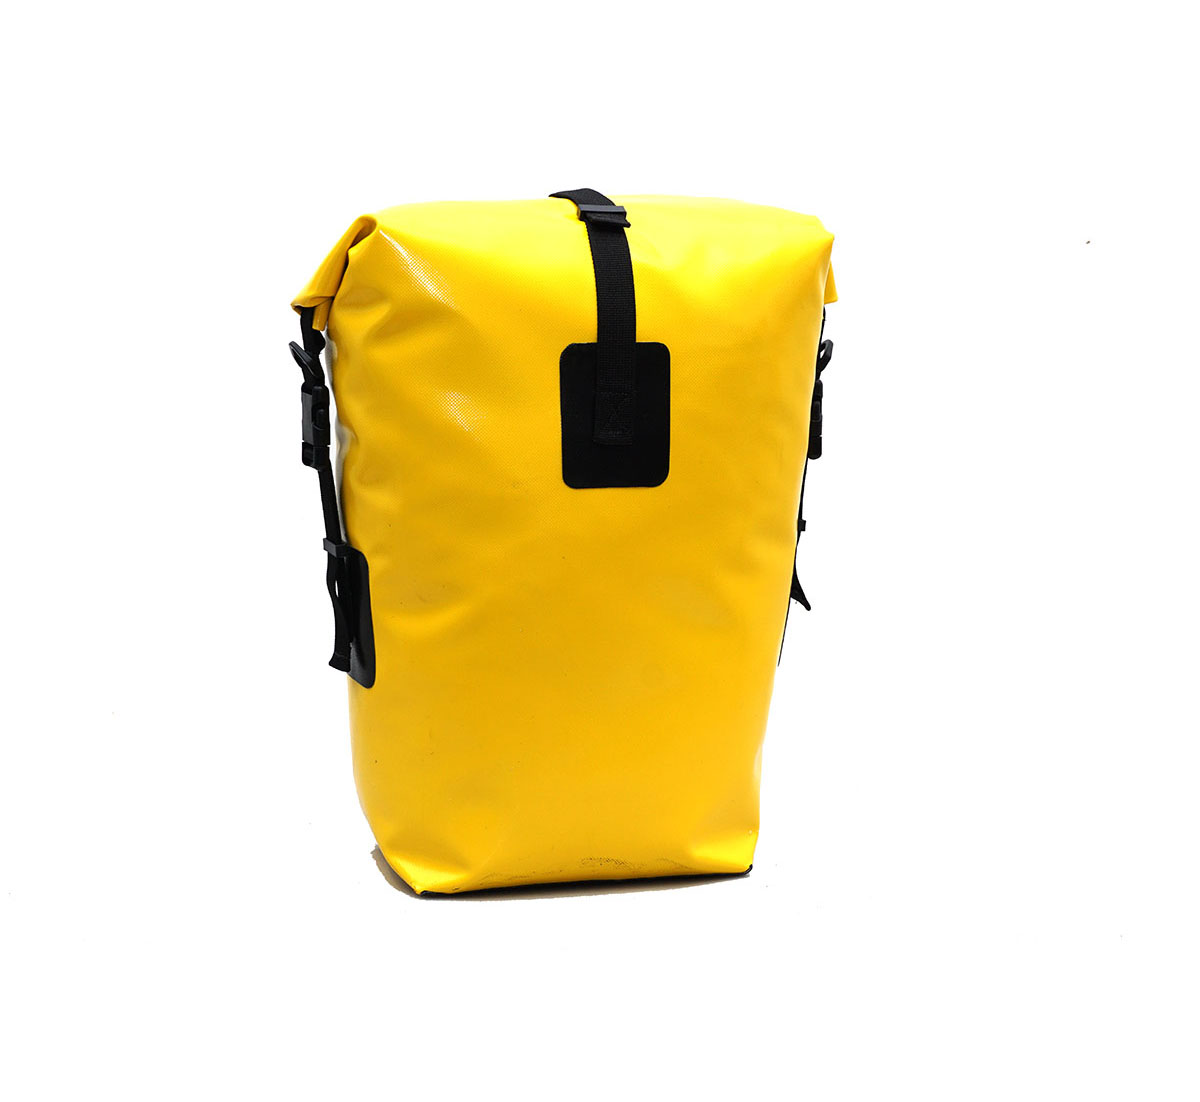 Alforje Corisco C32 - 100% impermeável - Par Amarelo - Loja Ondepedalar